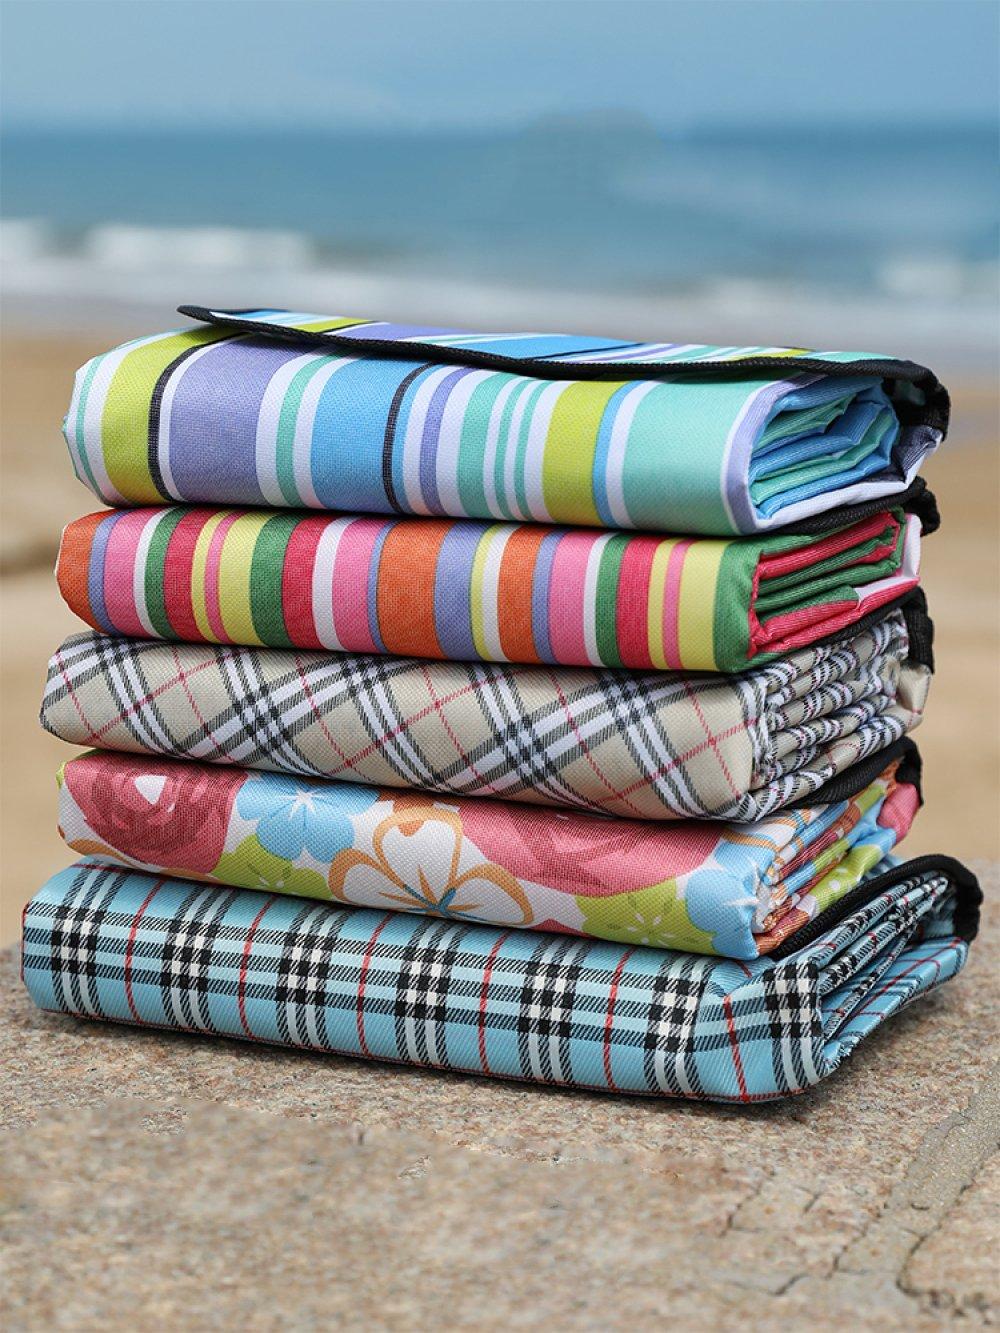 Jiu Bu Bu Bu Grasmatte Im Freien Picknick-Tuch Tragbar Ultraleicht Zusammenklappbar Oxford-Tuch Strandmatte,F B07F76HNY9 | Kaufen  51bfbf